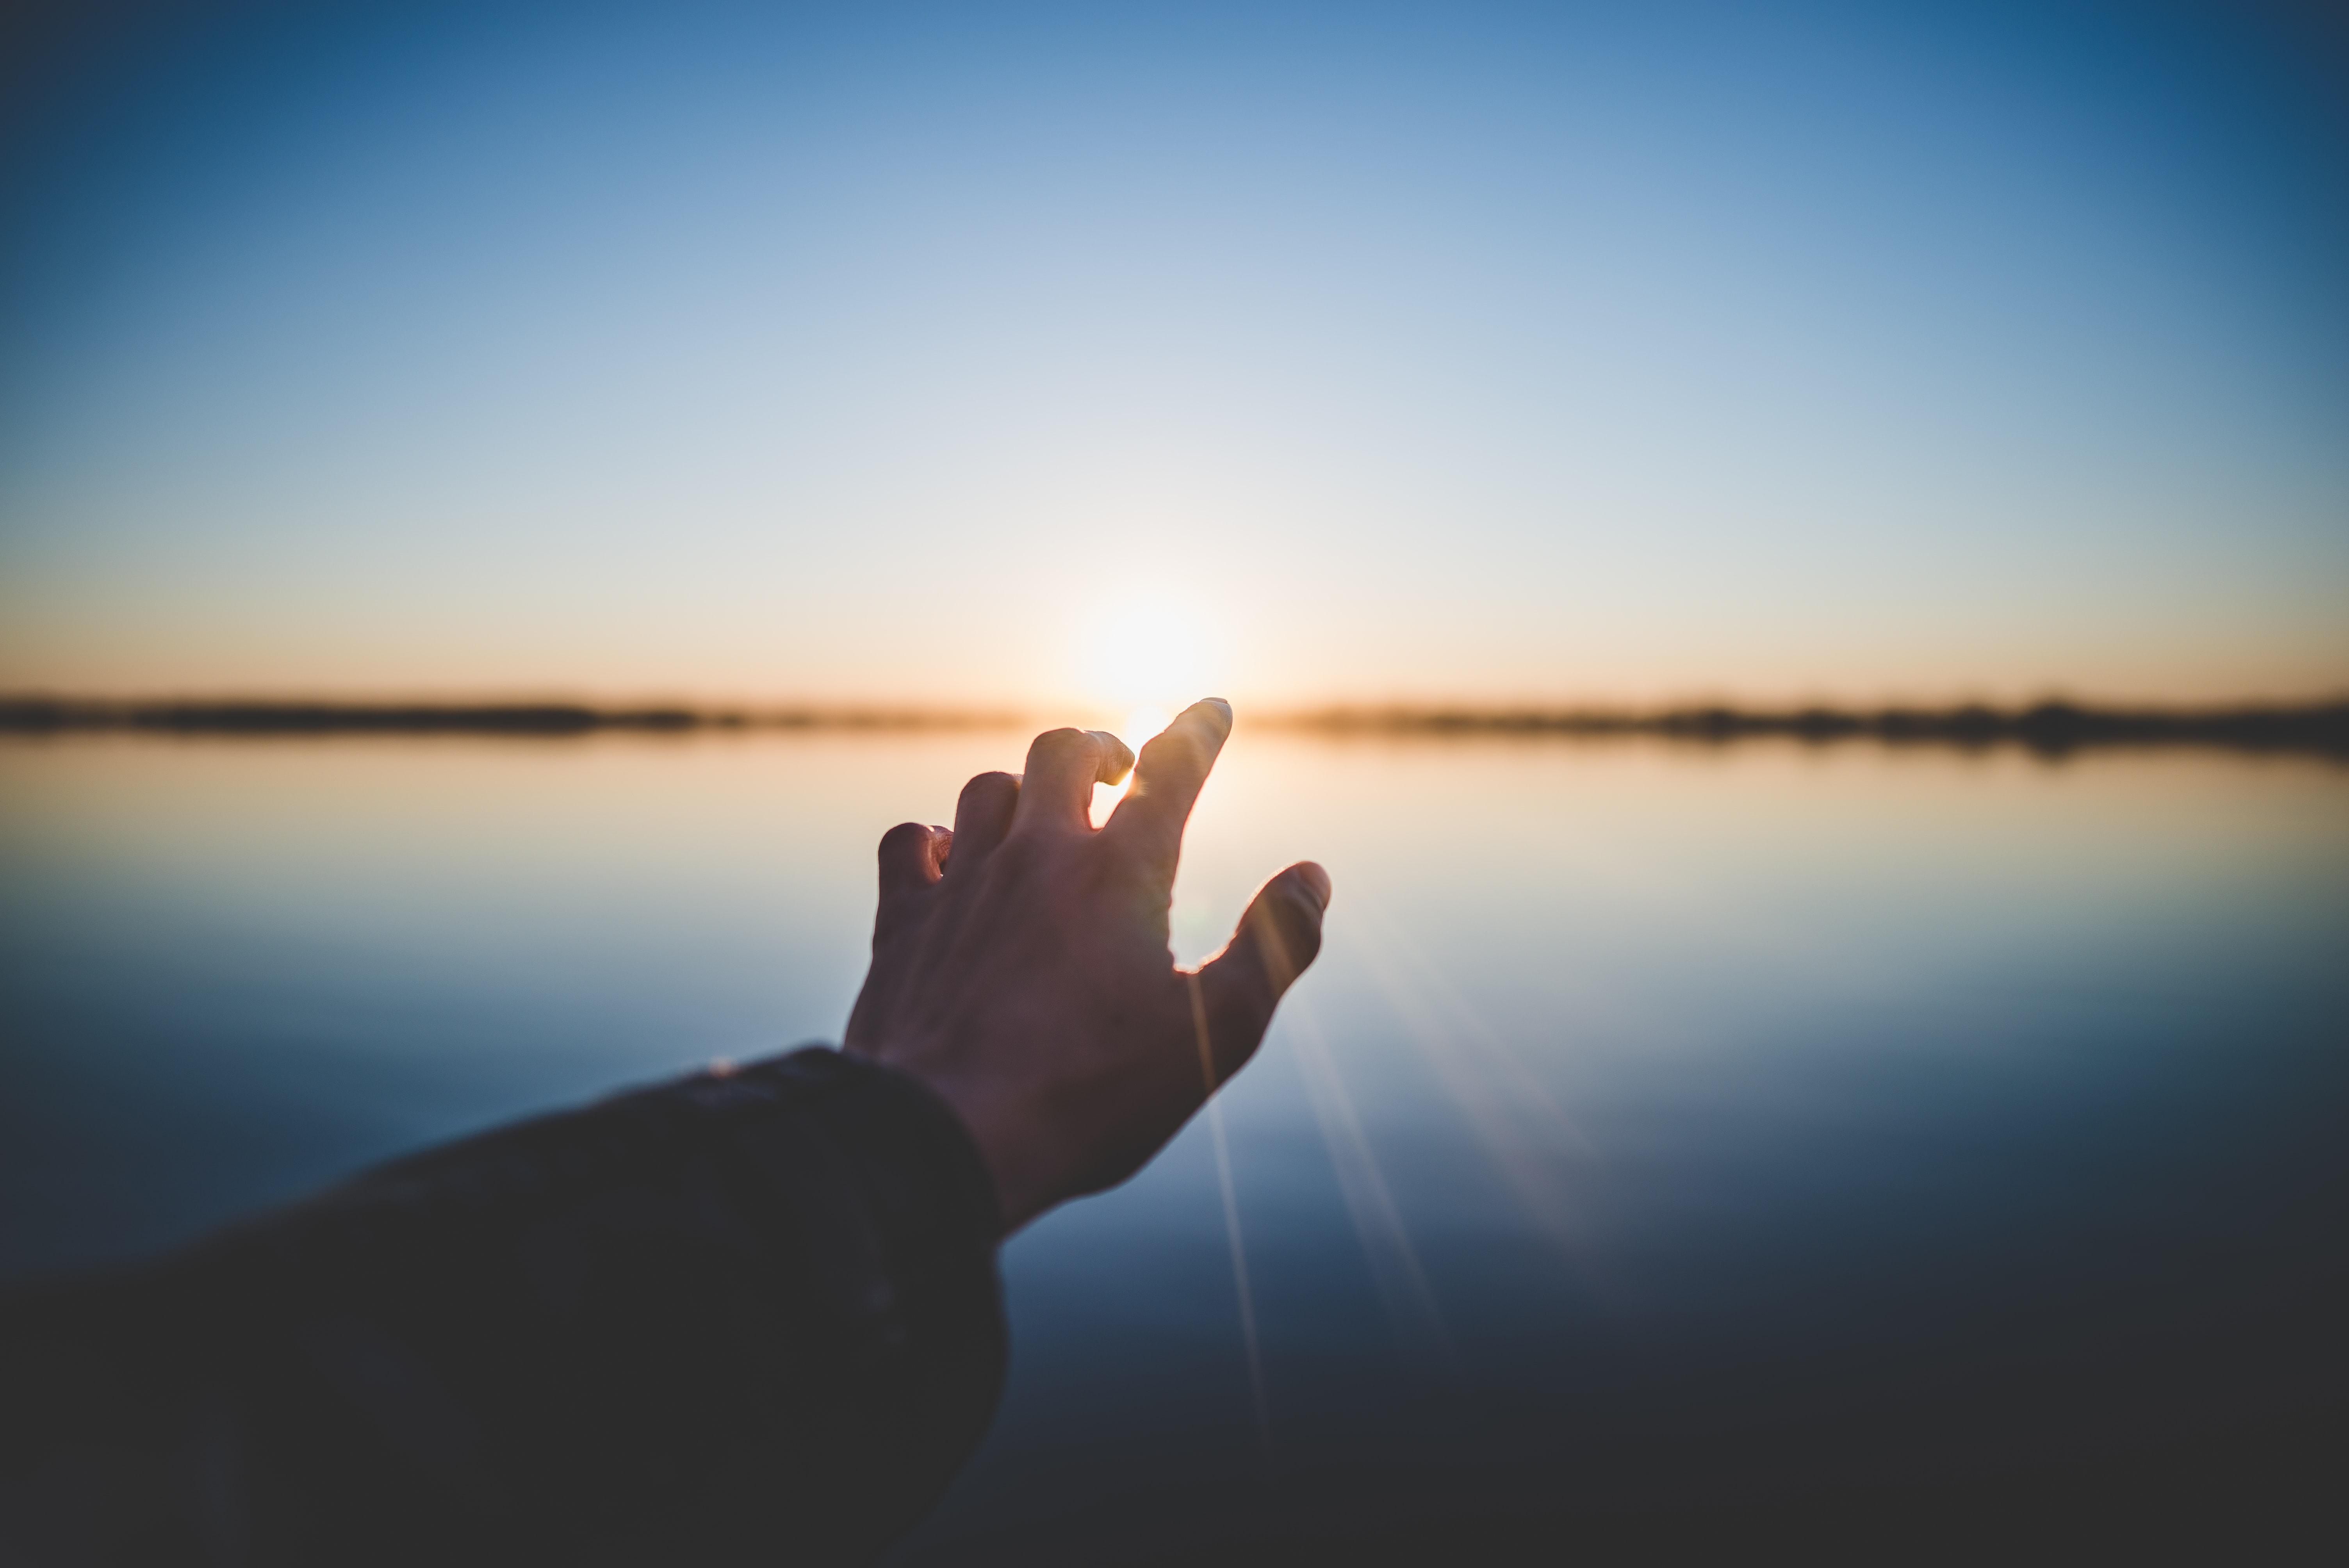 a finger reaching towards sunrise